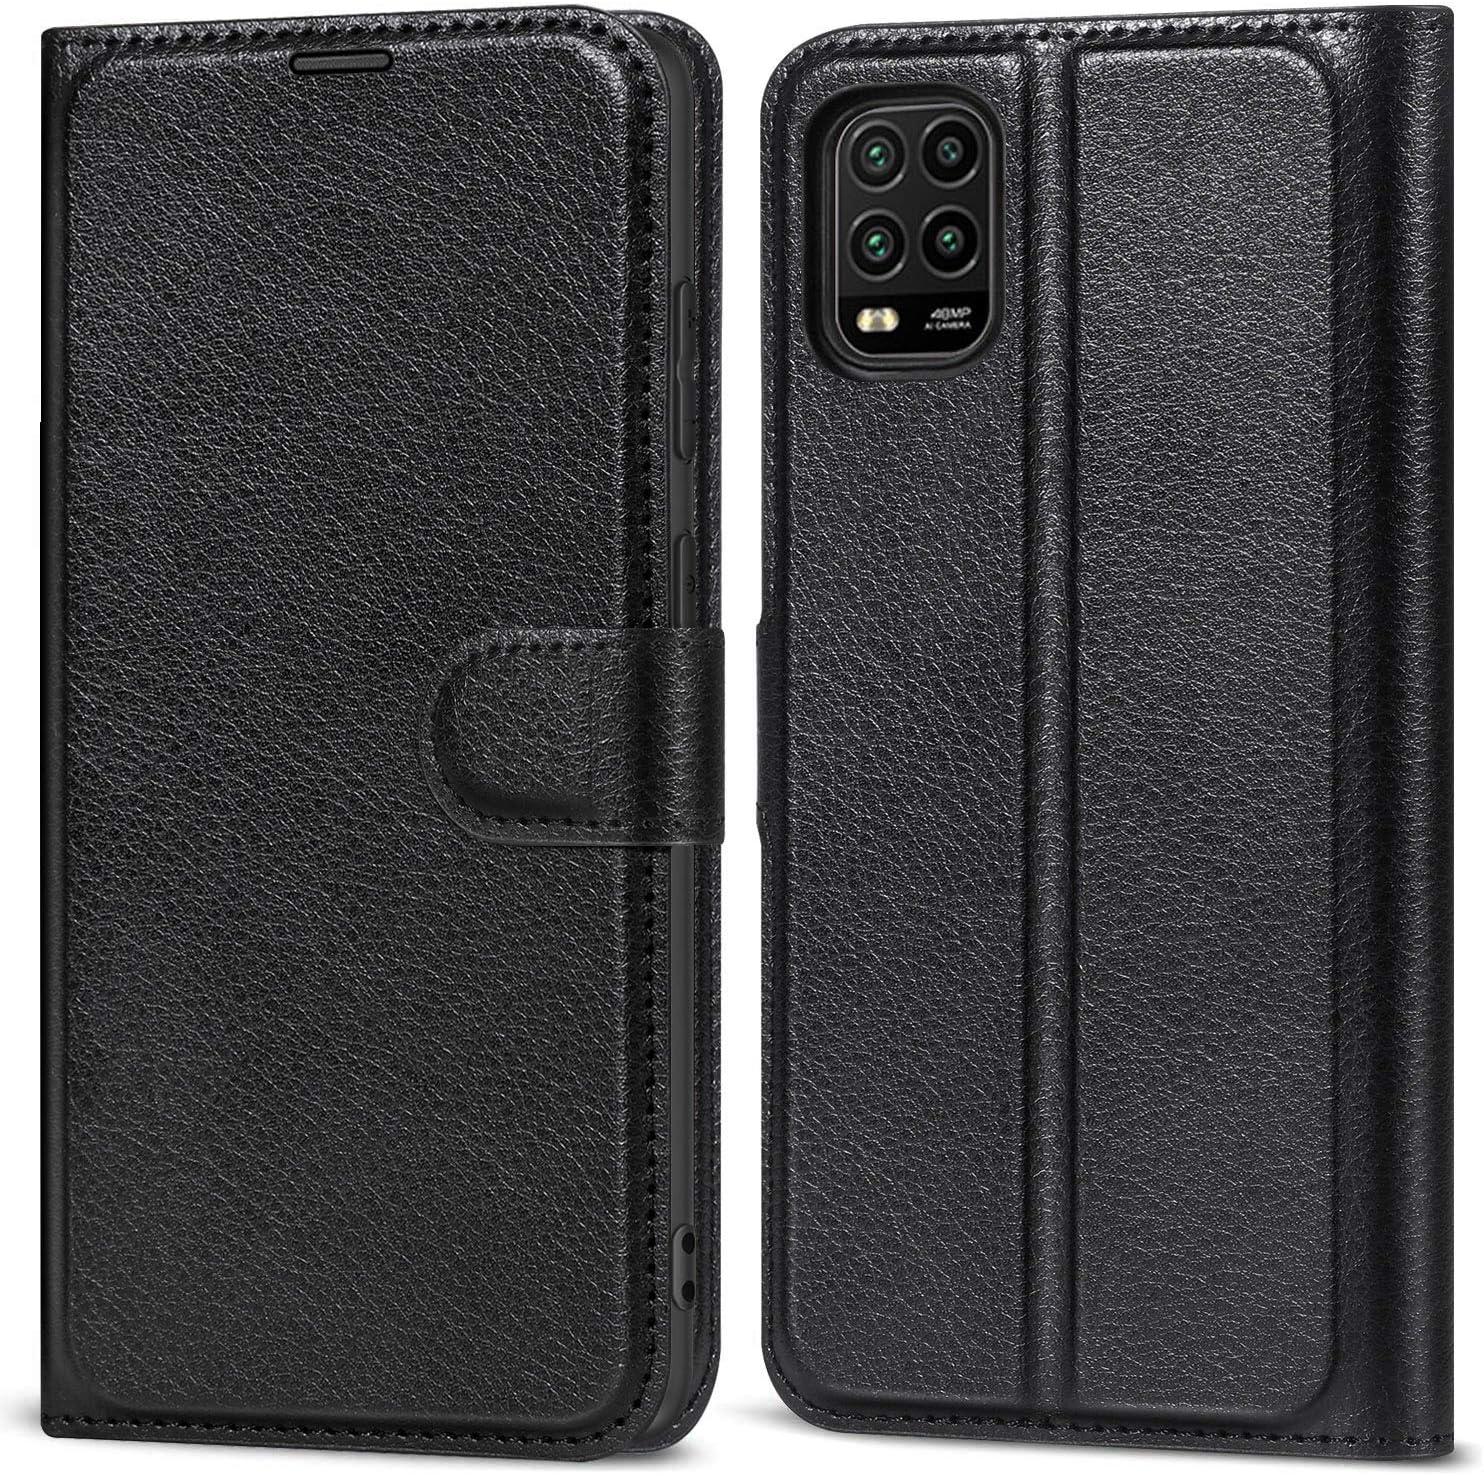 YoTEer Funda para Xiaomi Mi 10 Lite 5G, PU Premium Cuero Flip Folio Carcasa, Soporte Plegable, Ranuras para Tarjetas, Cierre Magnético Funda Libro para Xiaomi Mi 10 Lite 5G. (Negro)